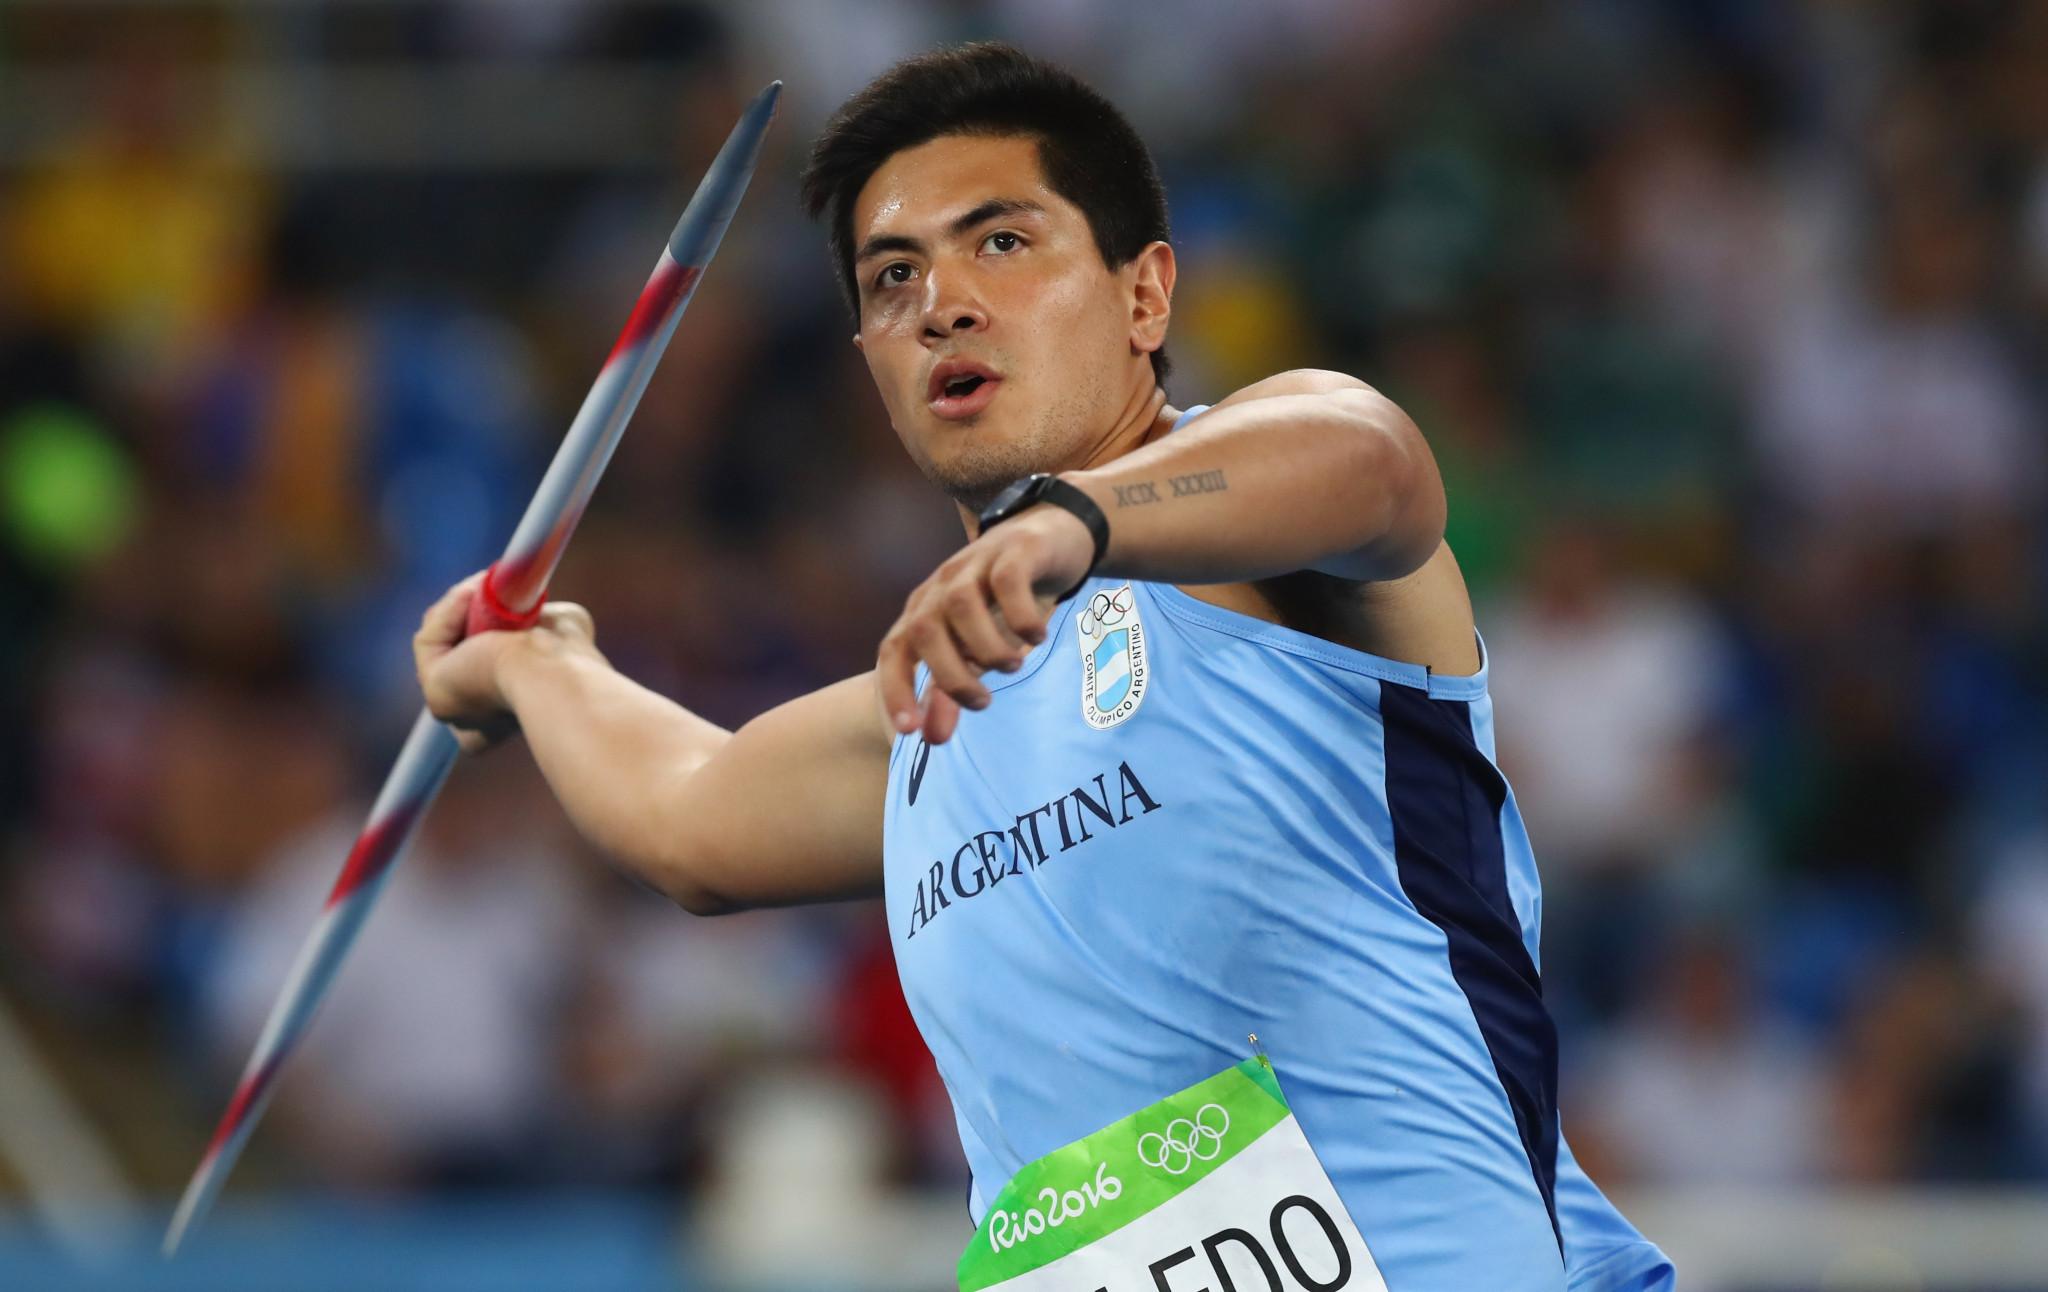 Argentinian javelin thrower killed in motorcycle crash months before Tokyo 2020